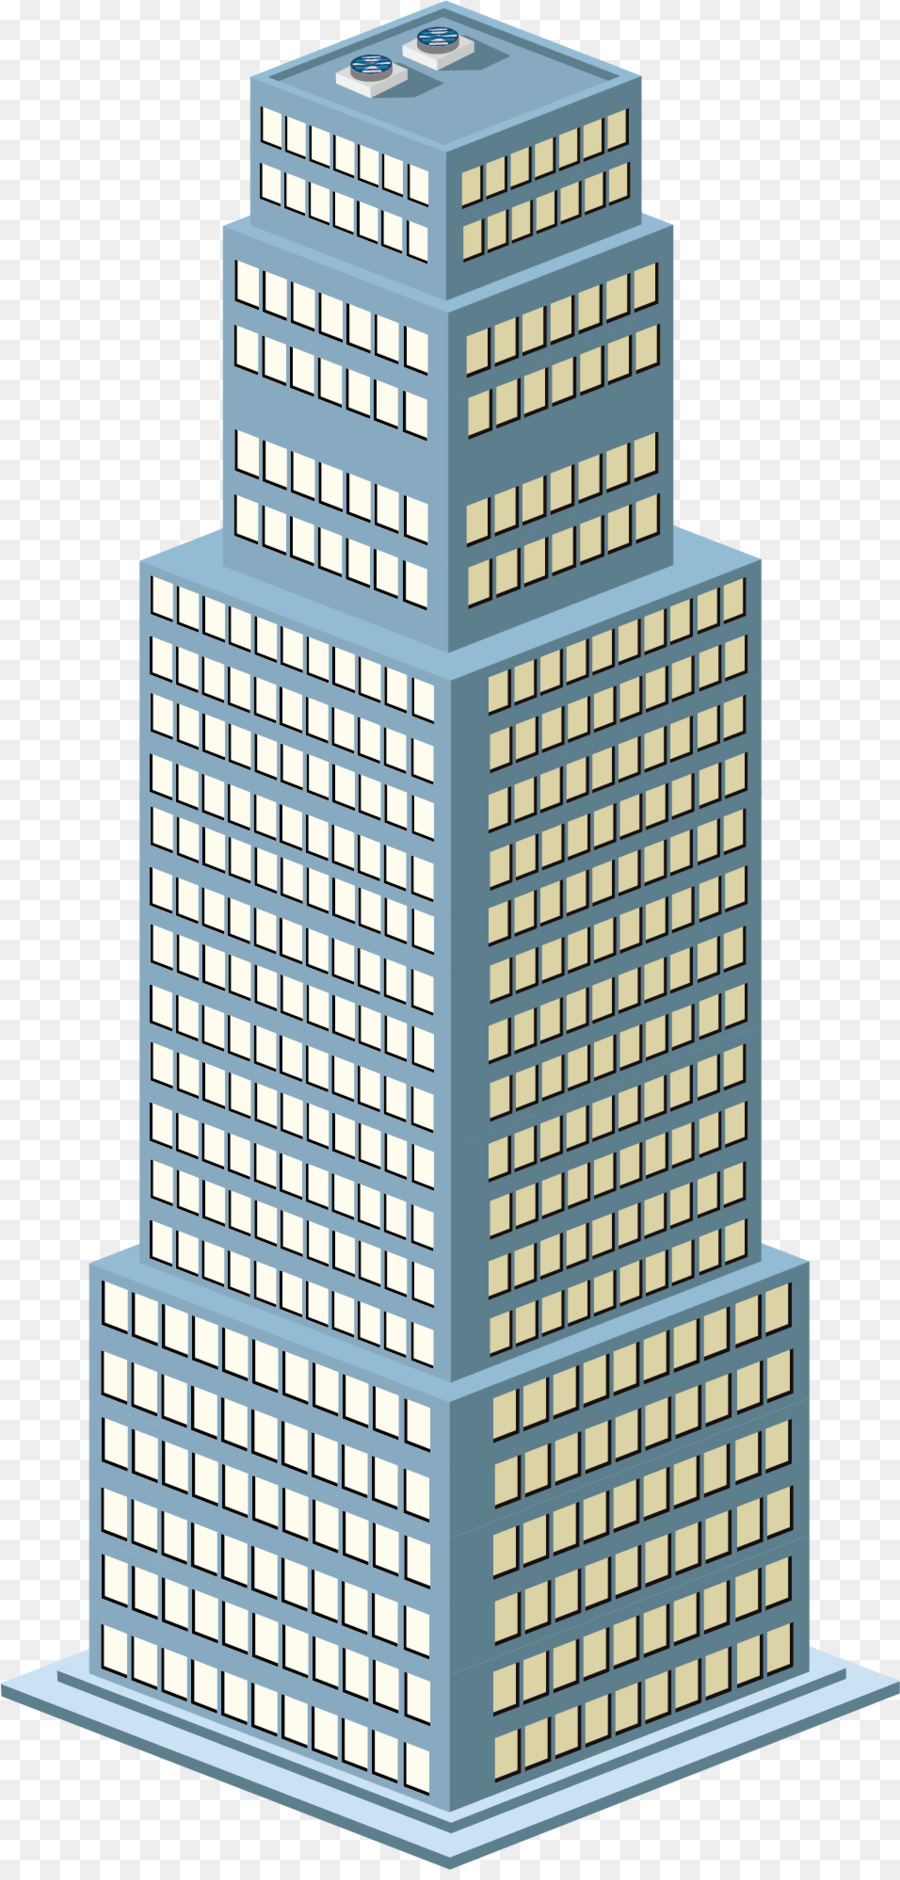 Gambar Kantor Png : gambar, kantor, Building, Background, Download, 956*1986, Transparent, Download., CleanPNG, KissPNG